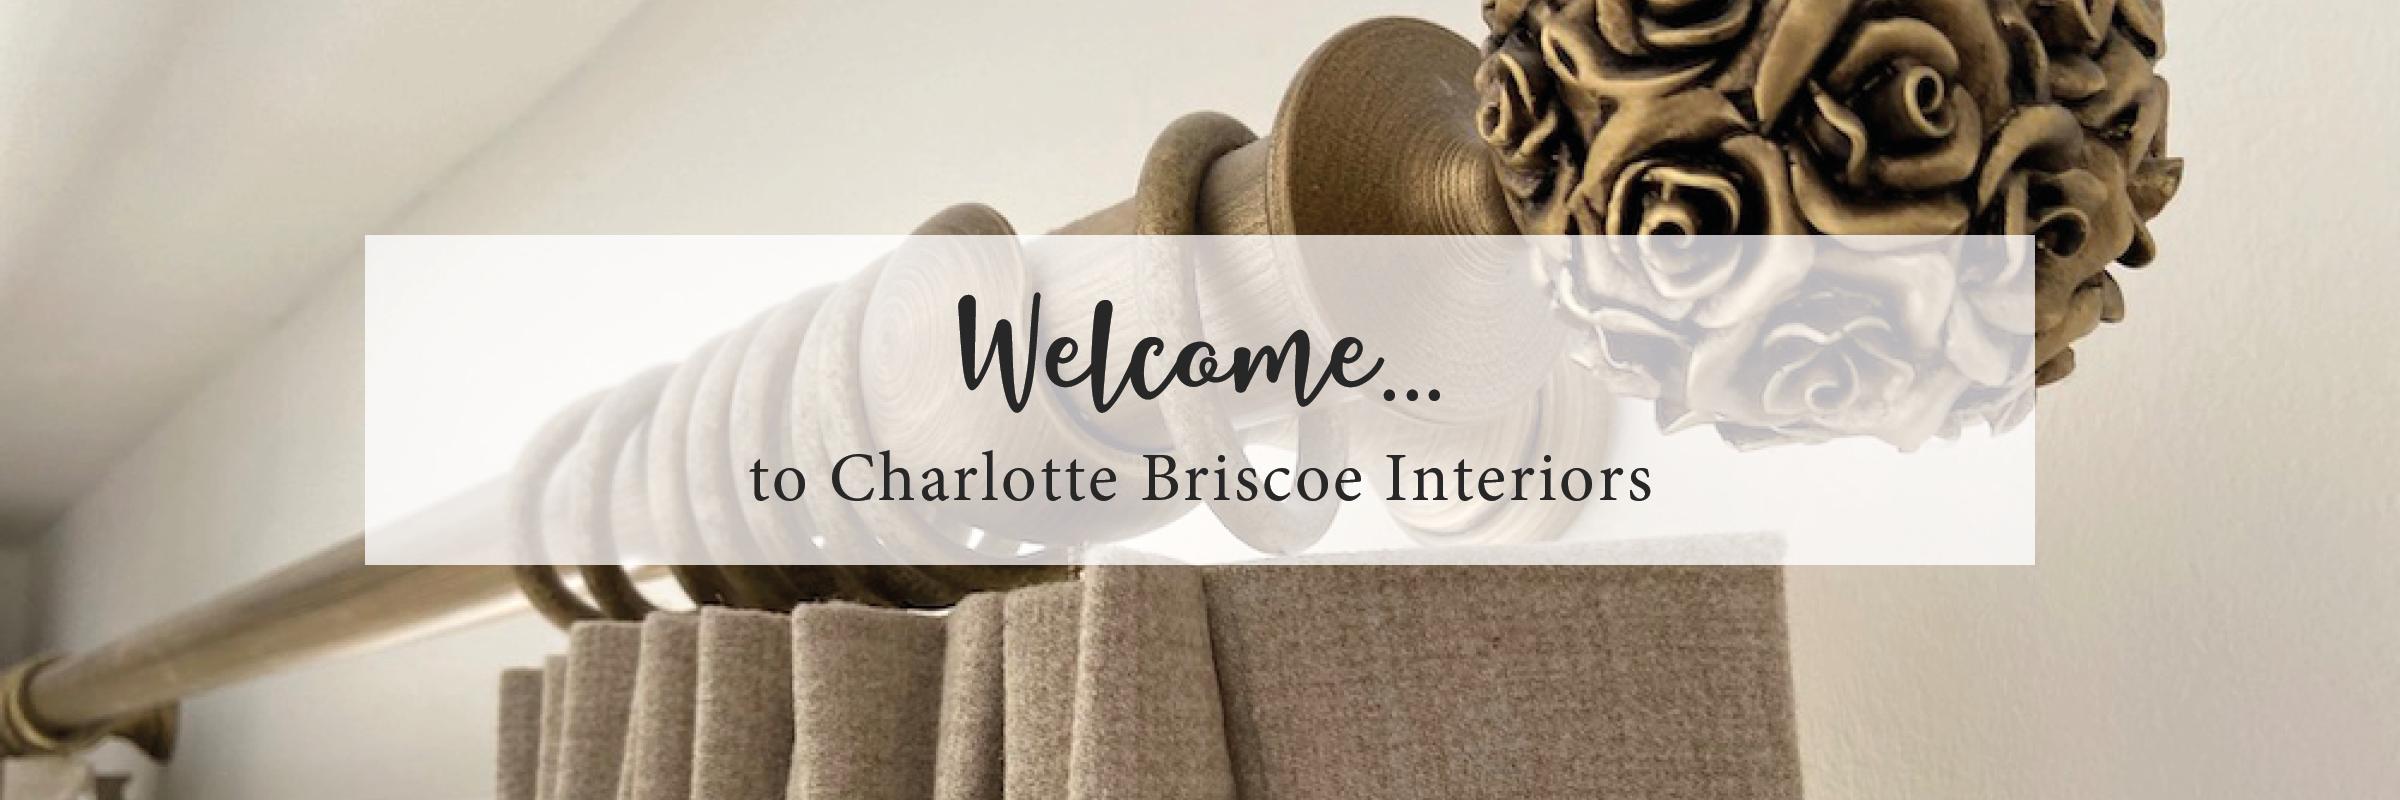 Charlotte Briscoe Interiors Slider